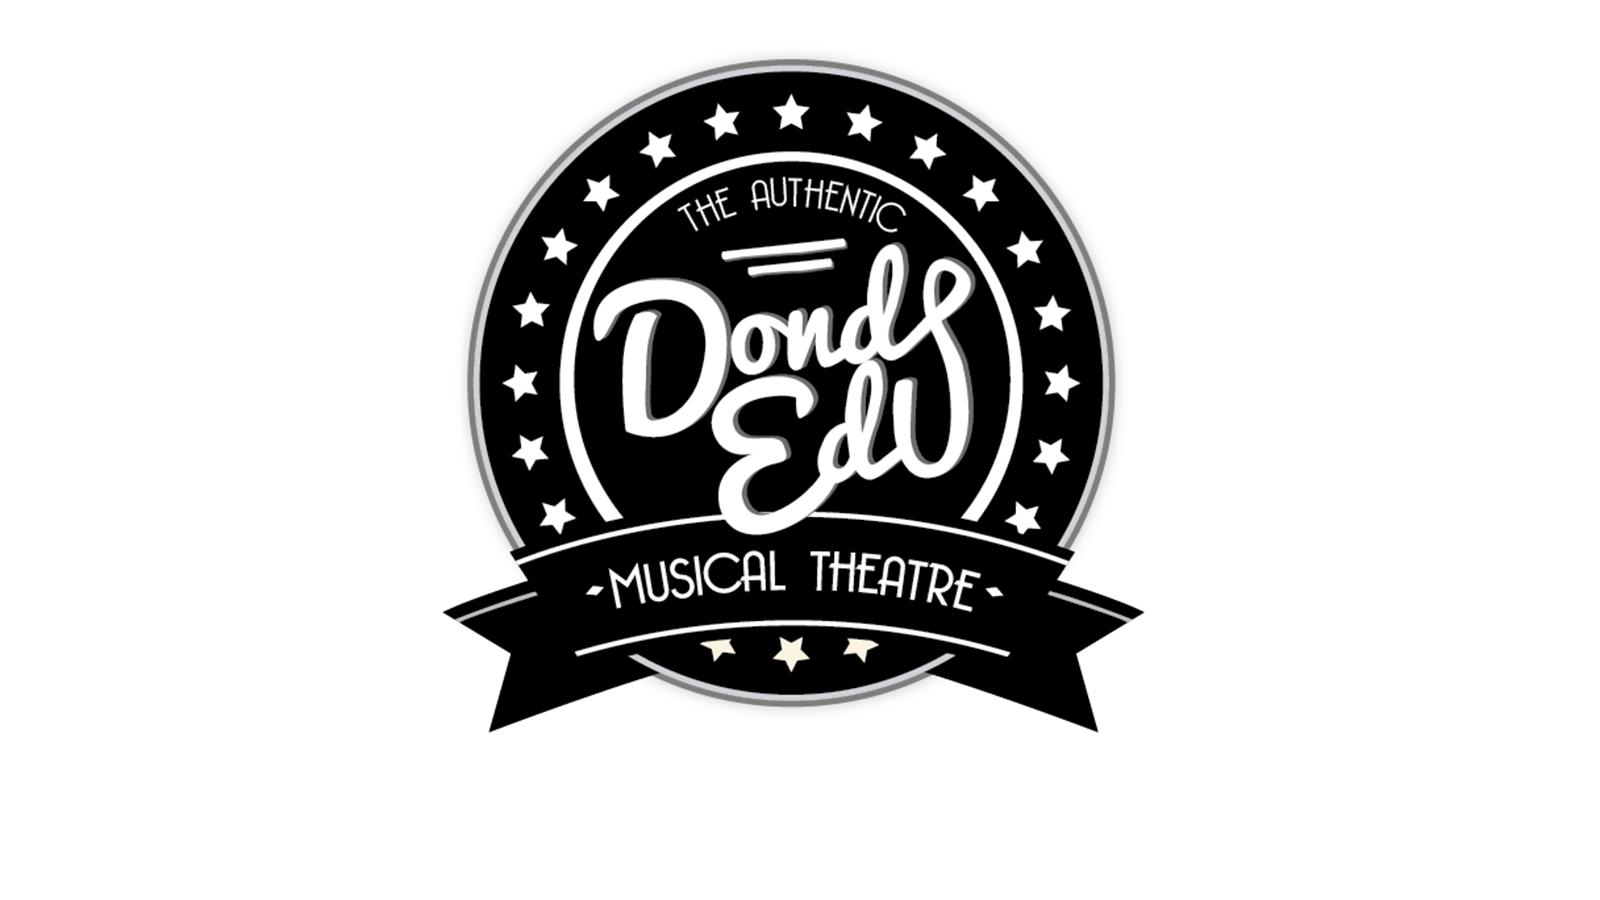 Logo de Donde Edu Musical Theatre